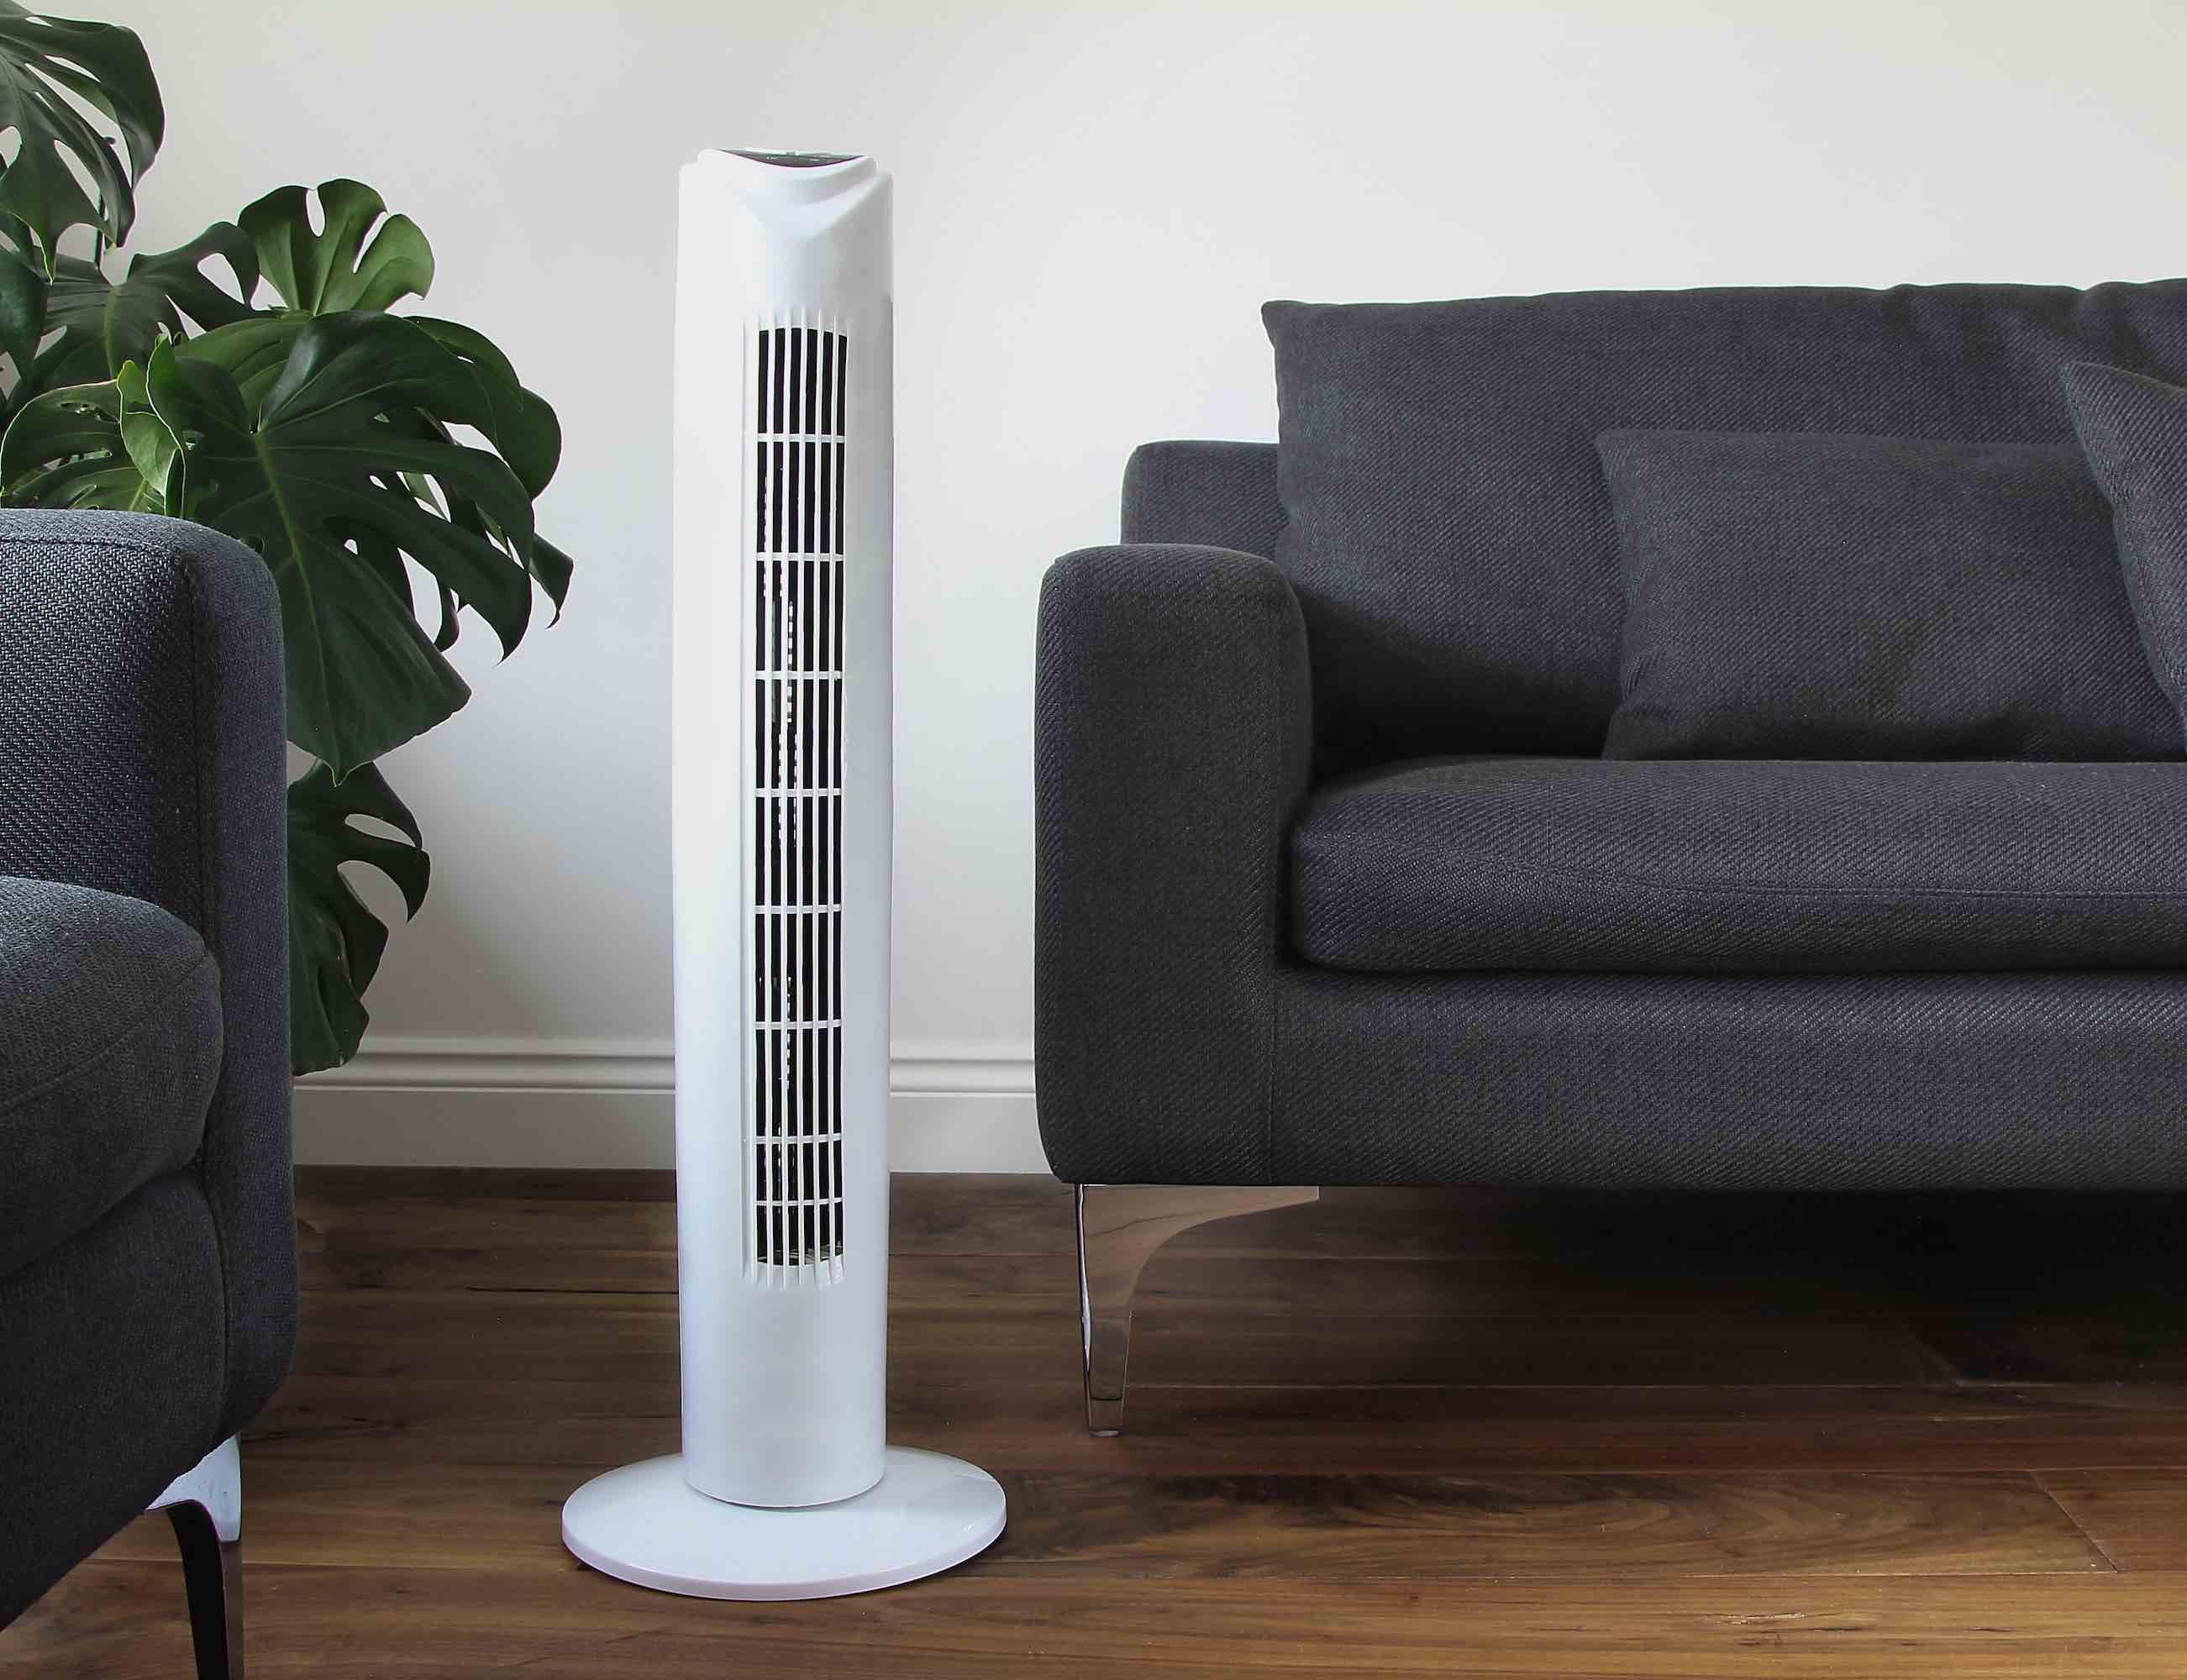 SMARTOWER Voice Controlled Smart Fan